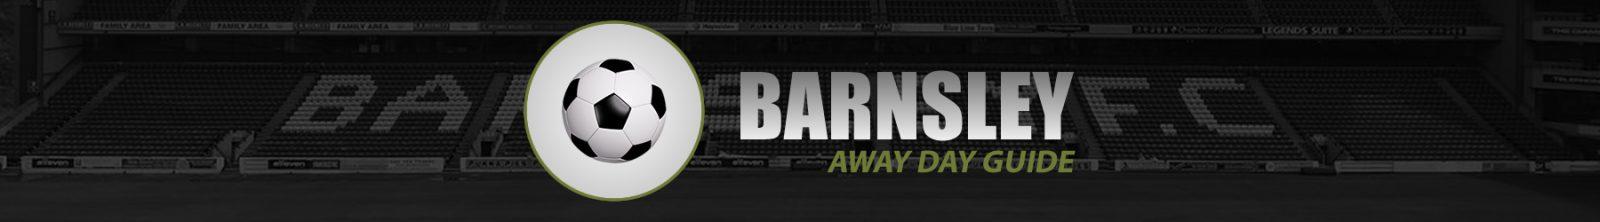 Barnsley Away